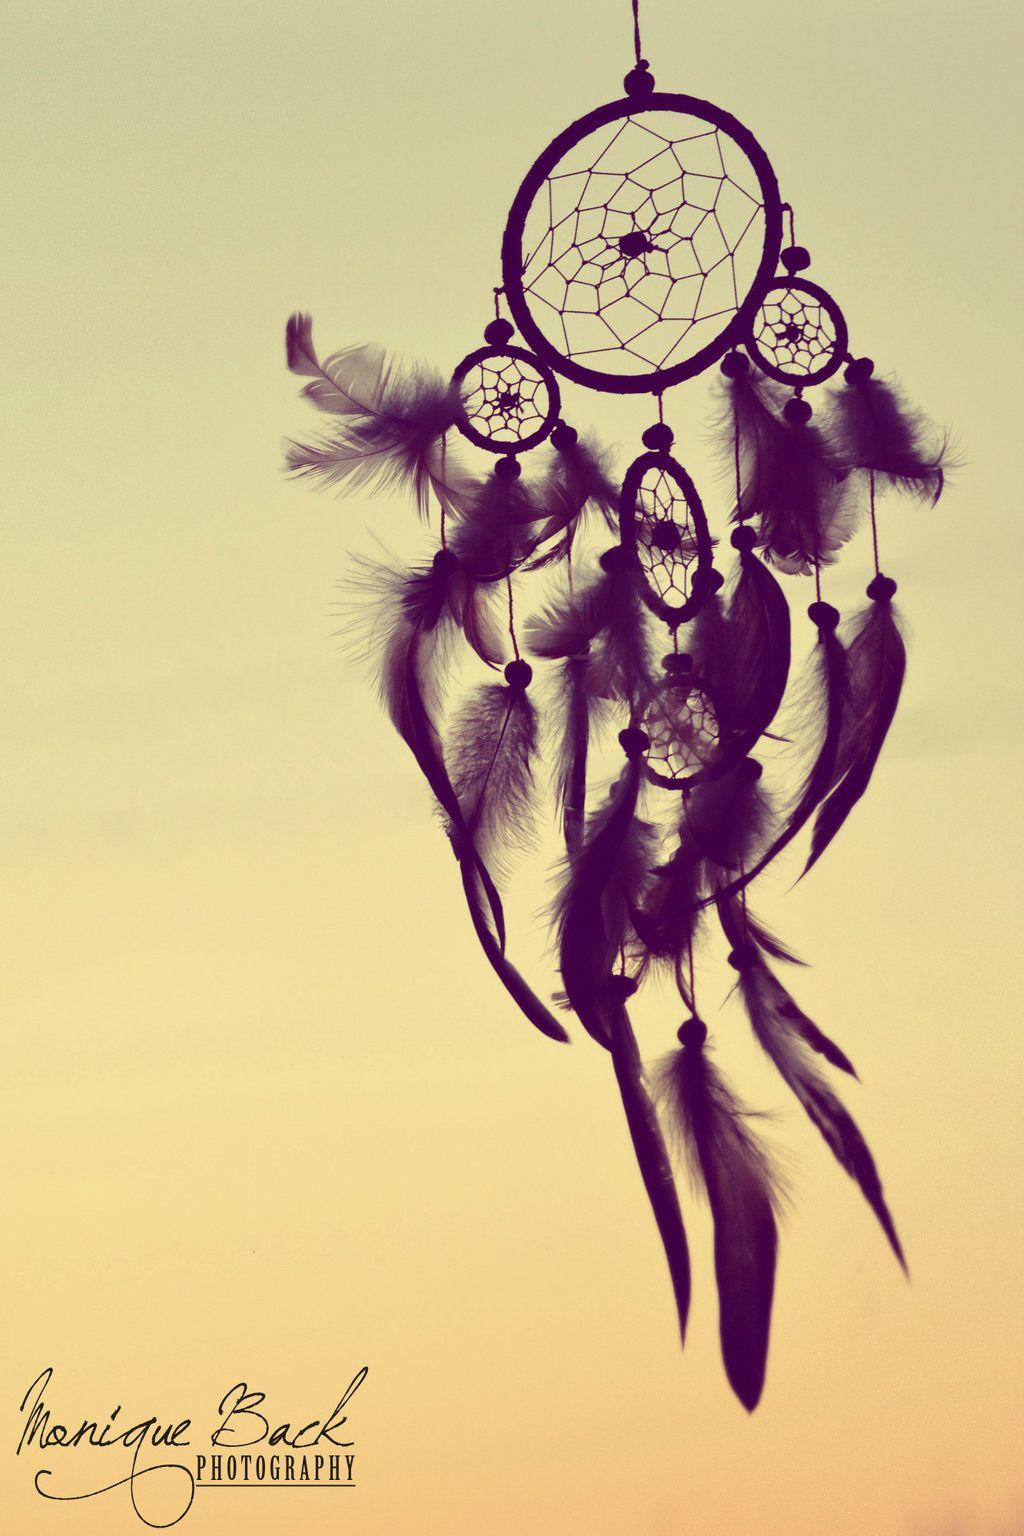 Unduh 77+ Wallpaper Tumblr Dreamcatcher Foto Gratis Terbaik